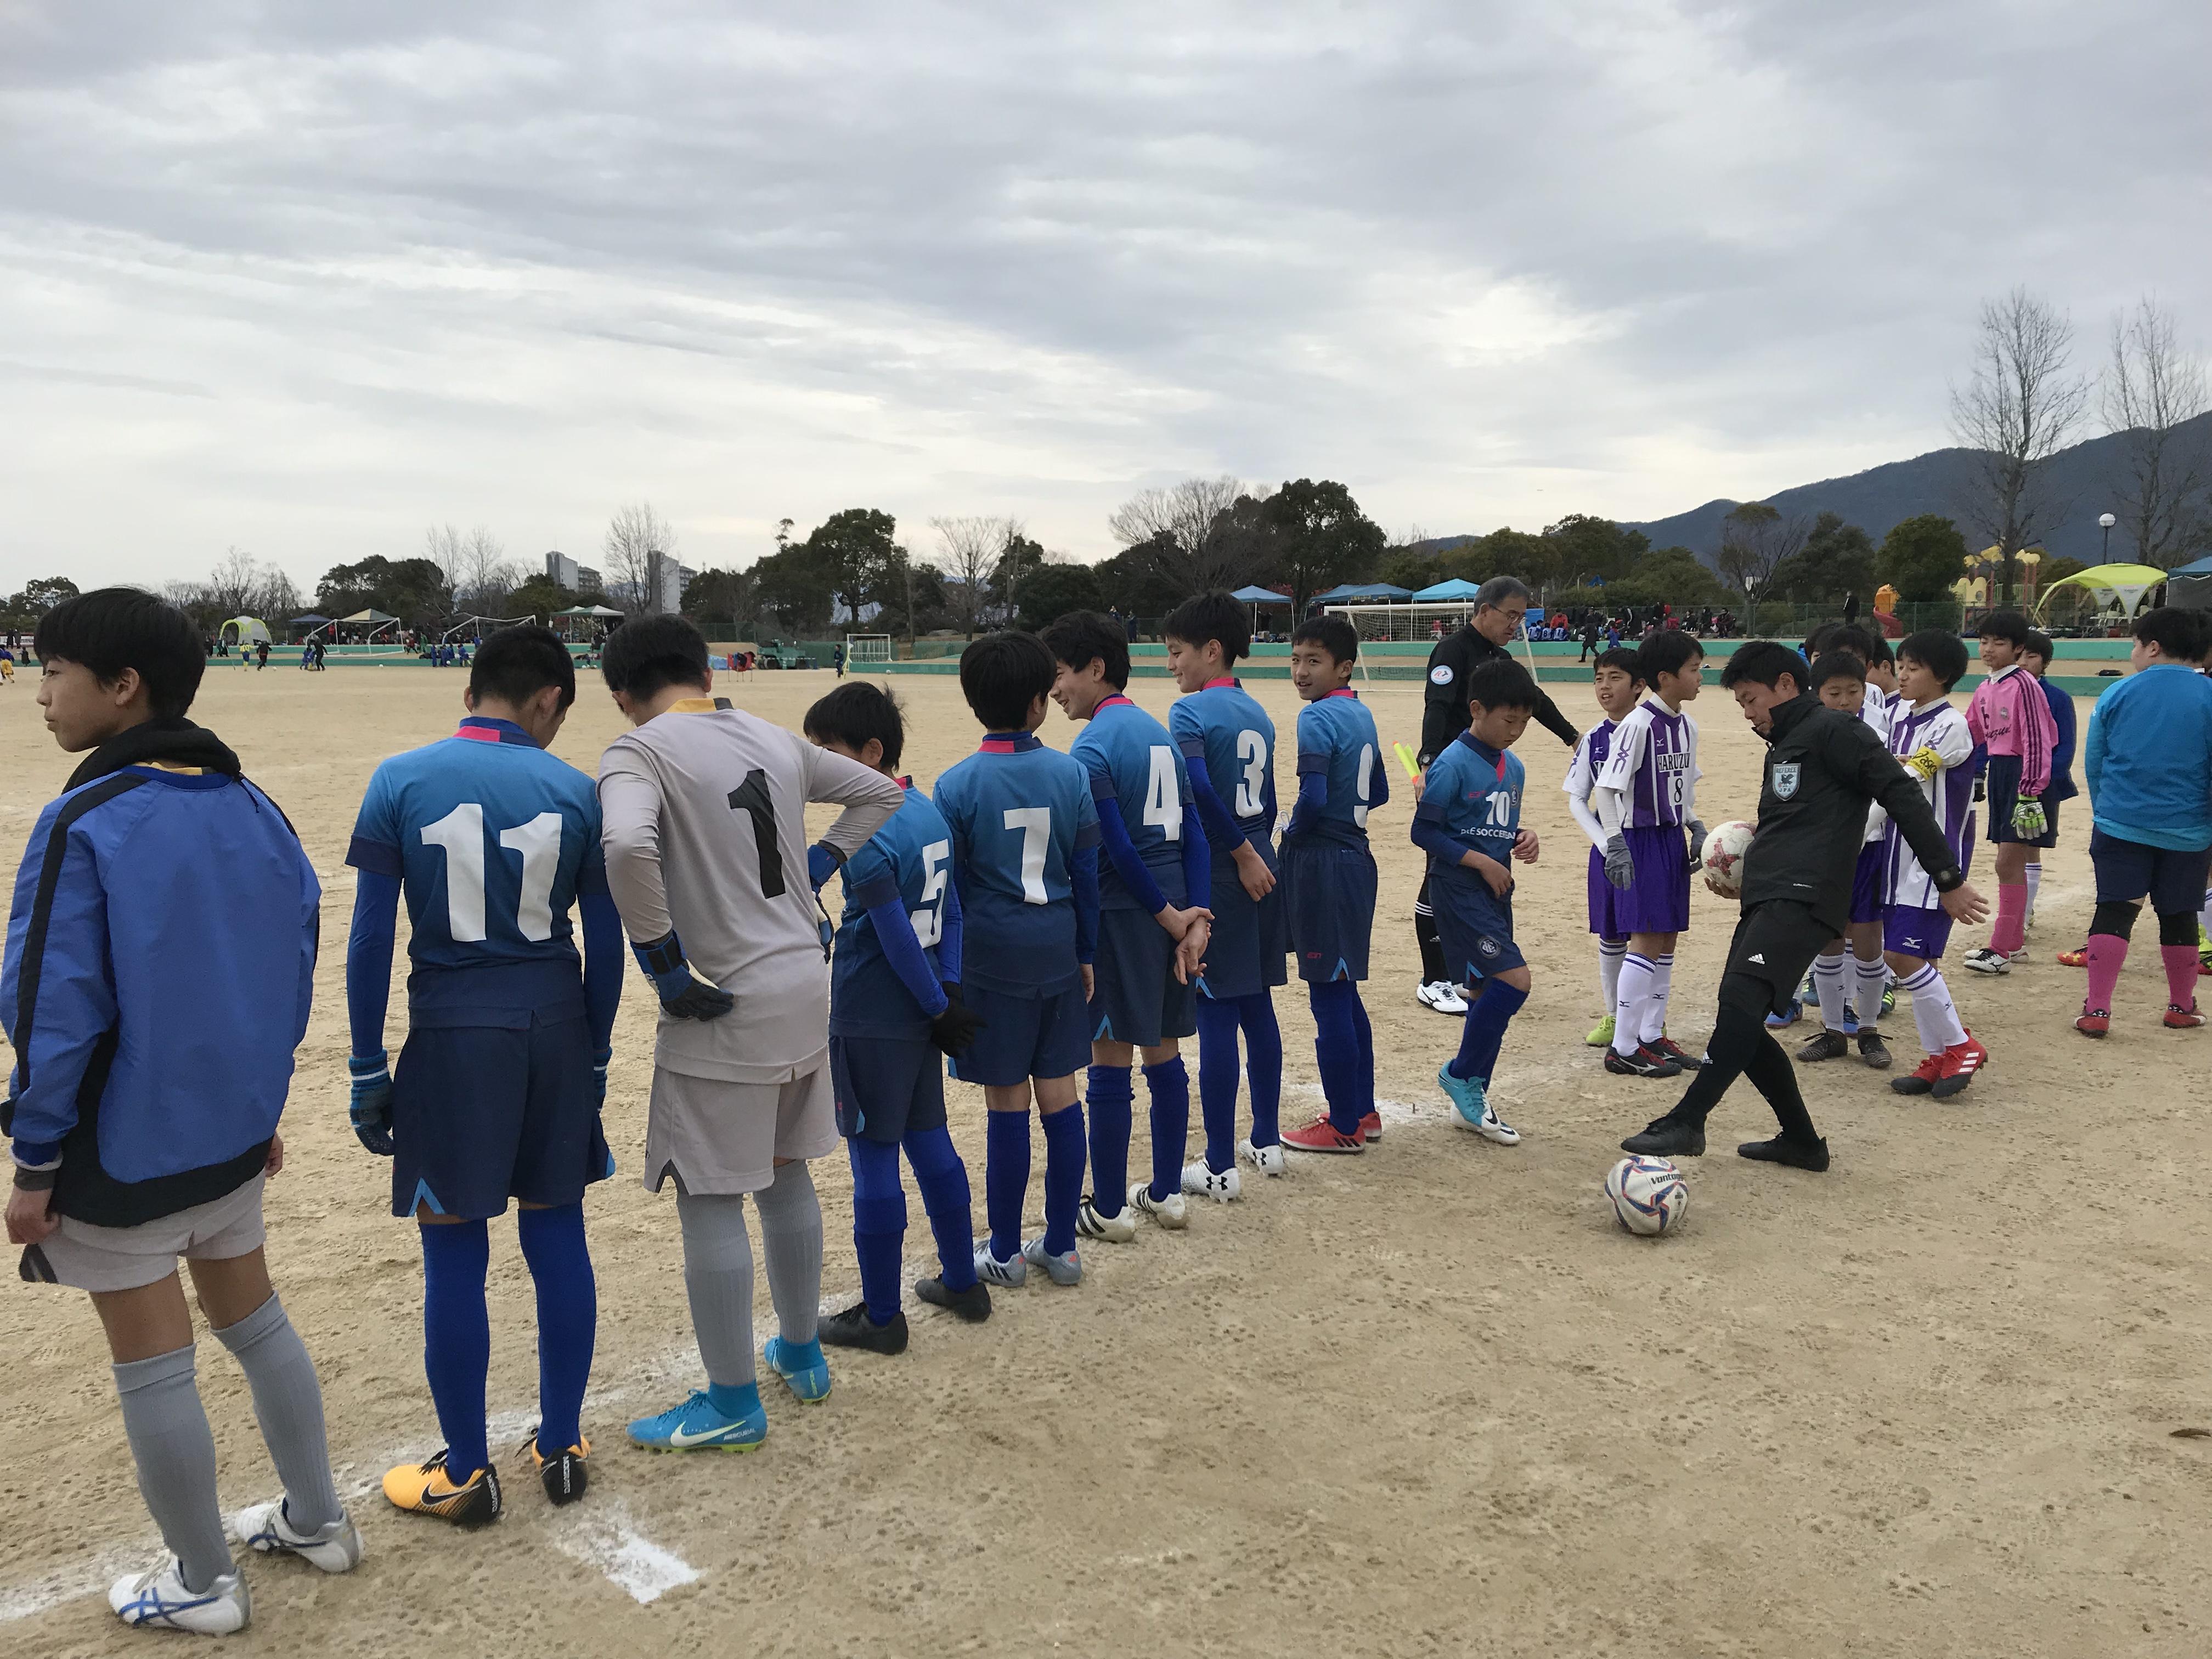 U-12 2nd 九州ジュニア 格上チームに勝利なるか!?